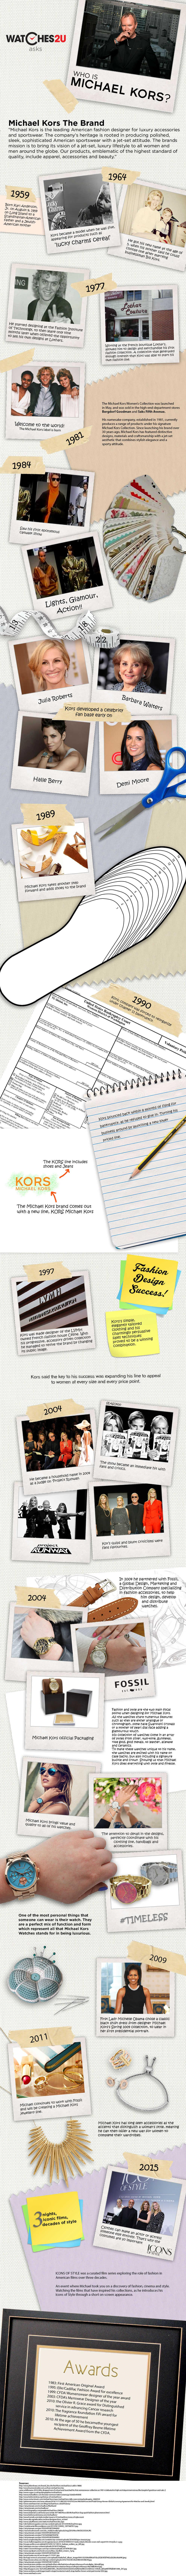 Who is Michael Kors?